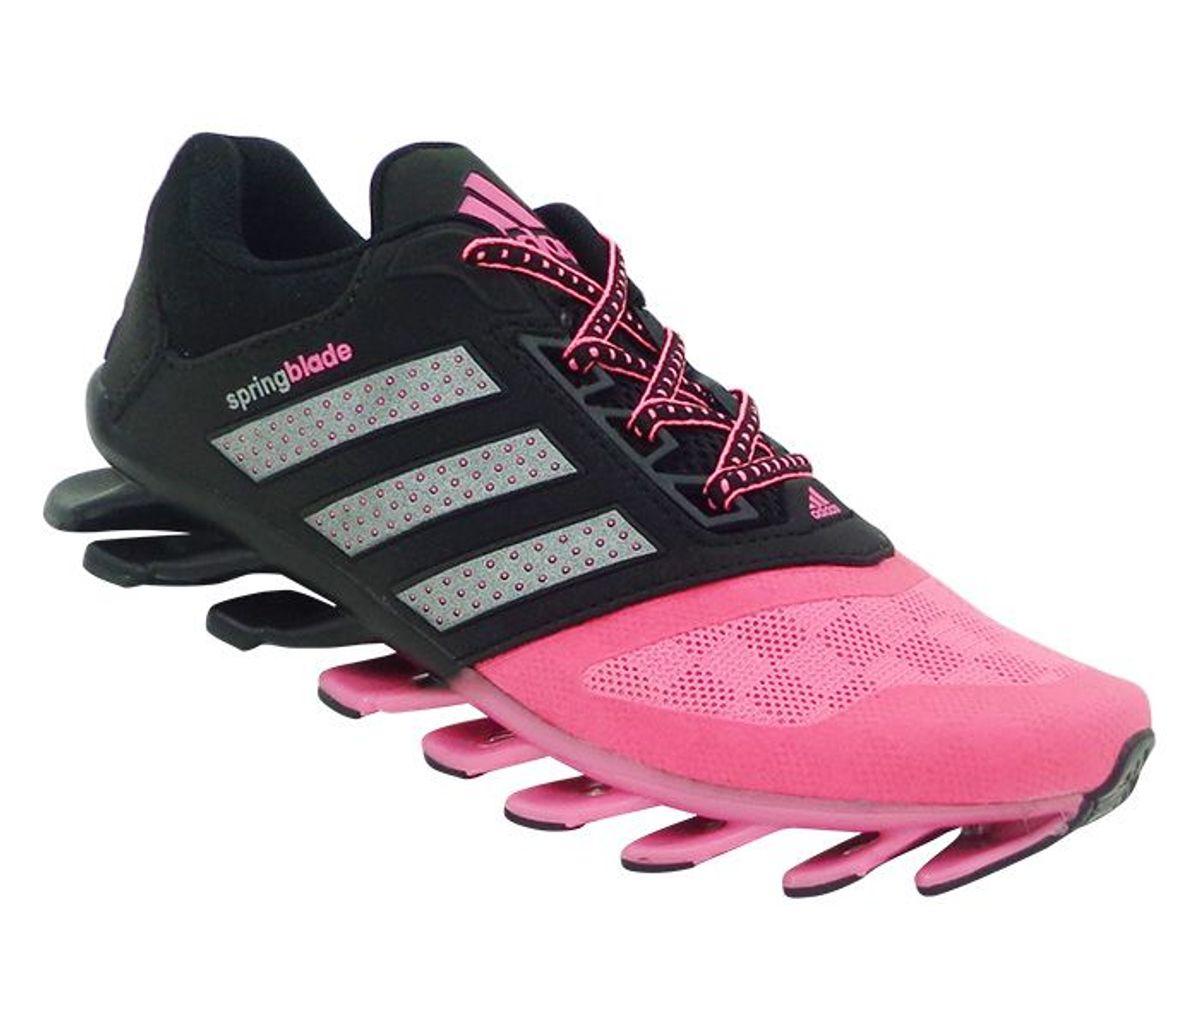 adidas springblade feminino cinza e rosa